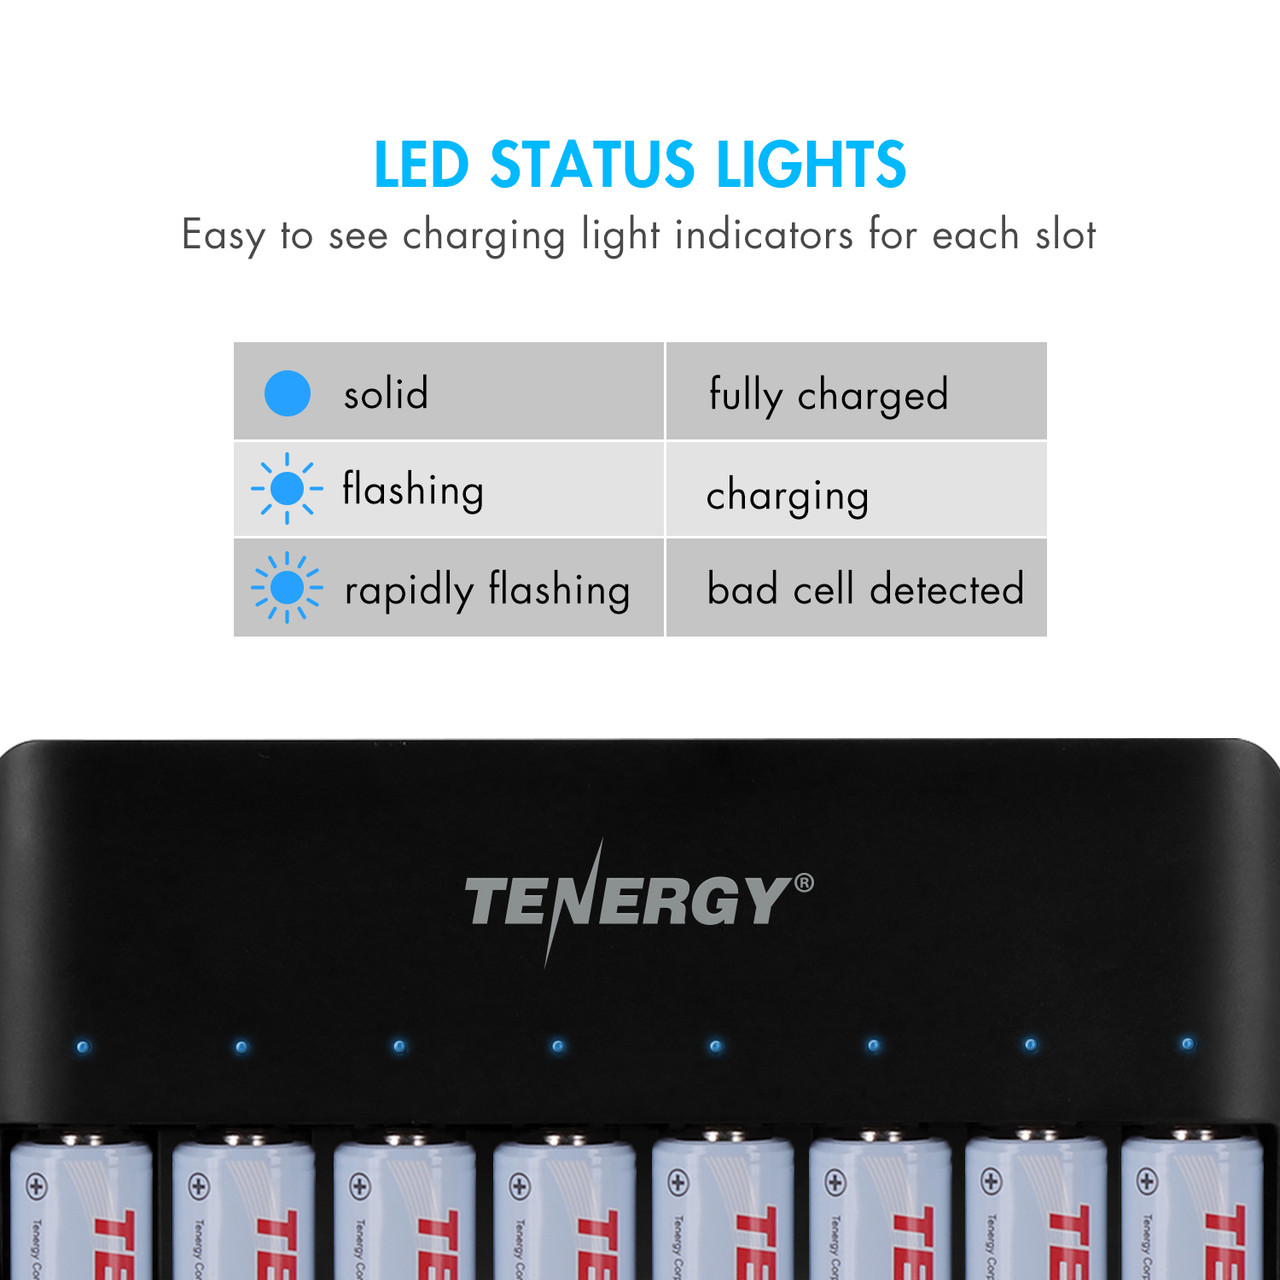 Combo: Tenergy TN477U 8-Bay NiMH Battery Fast Charger + 4pcs 2500mah AA and 4pcs 1000mah AAA Rechargeable Batteries